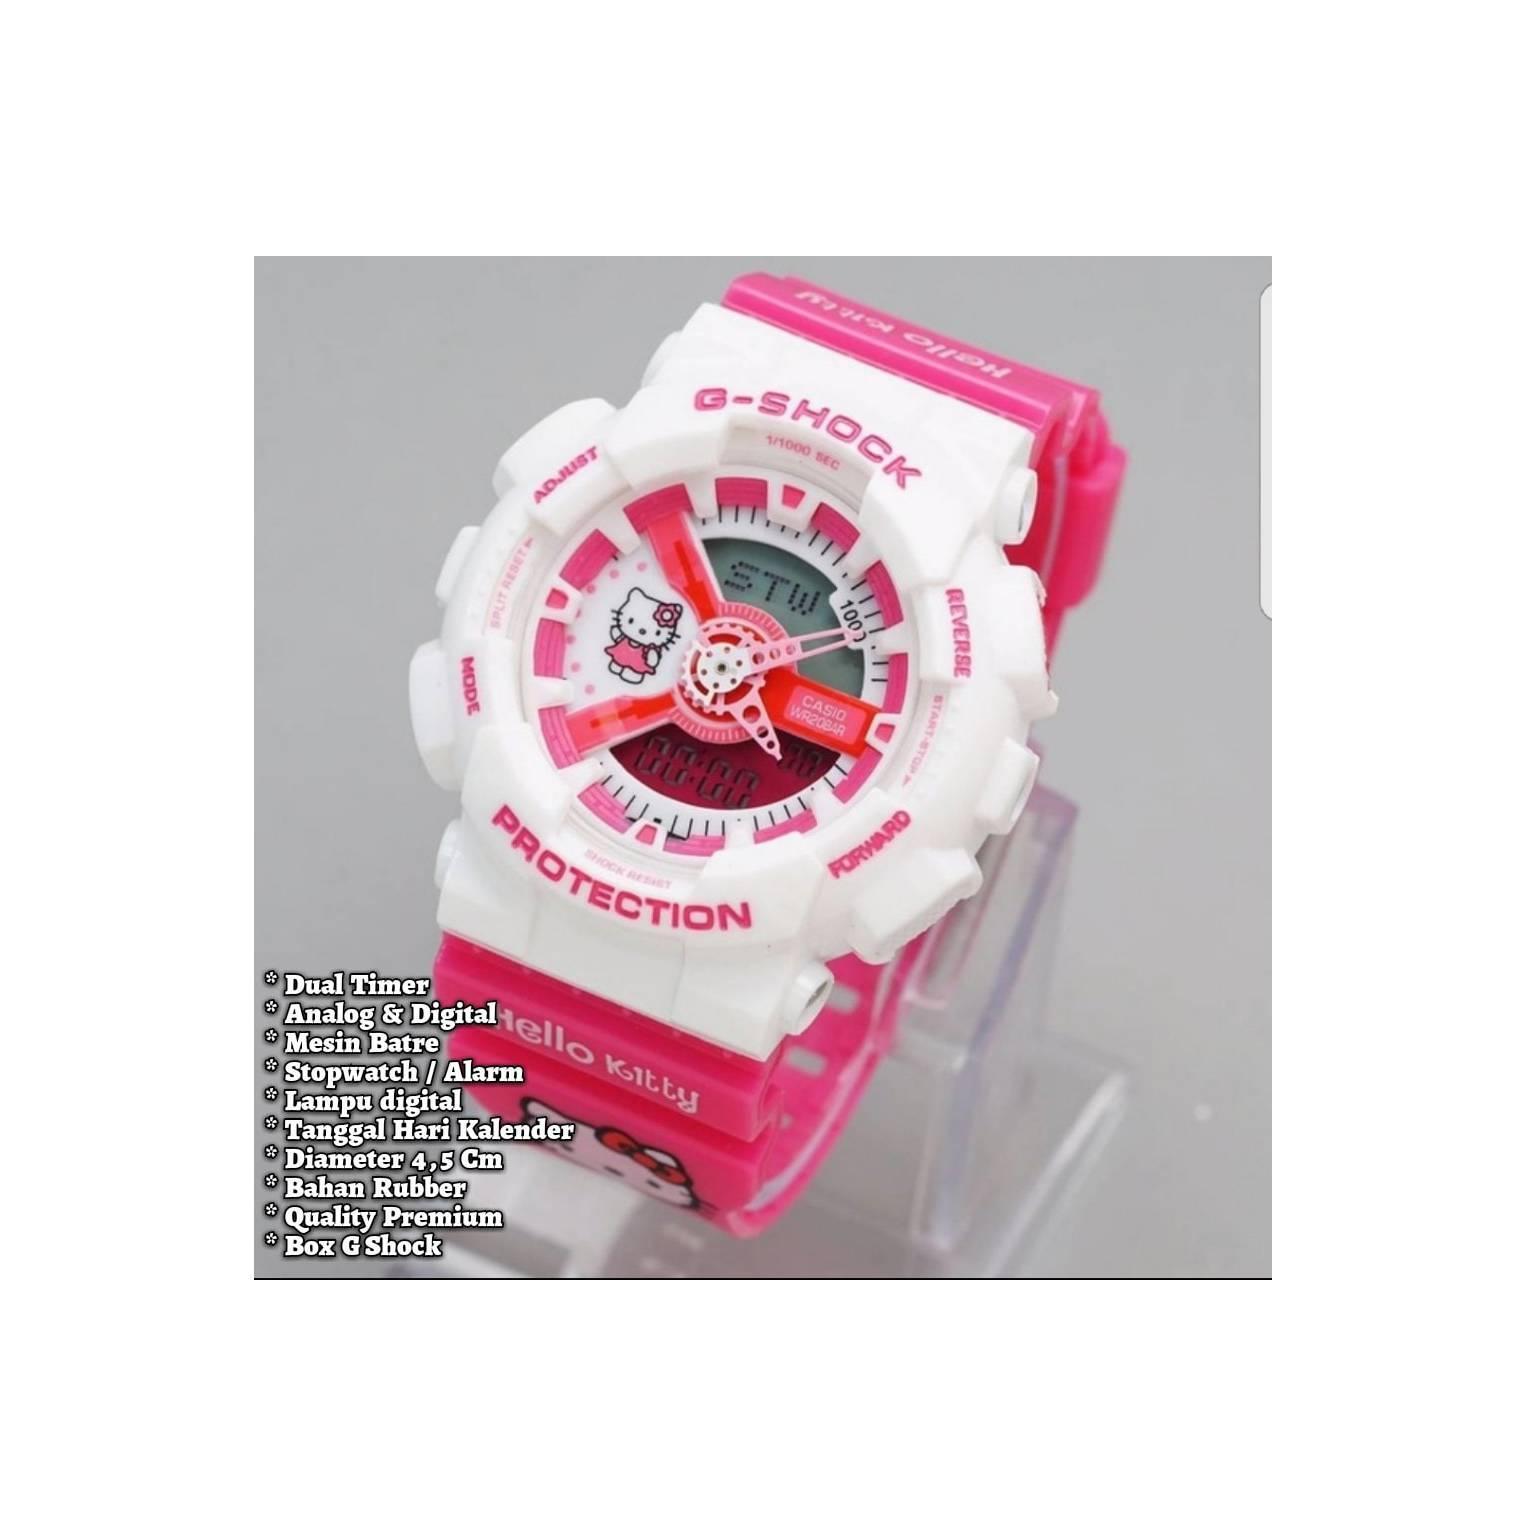 Casio G Shock Jam Tangan Pria Hitam Strap Resin Gd 350 1b Beli Original Wanita Hello Kitty Free Batre Cadangan